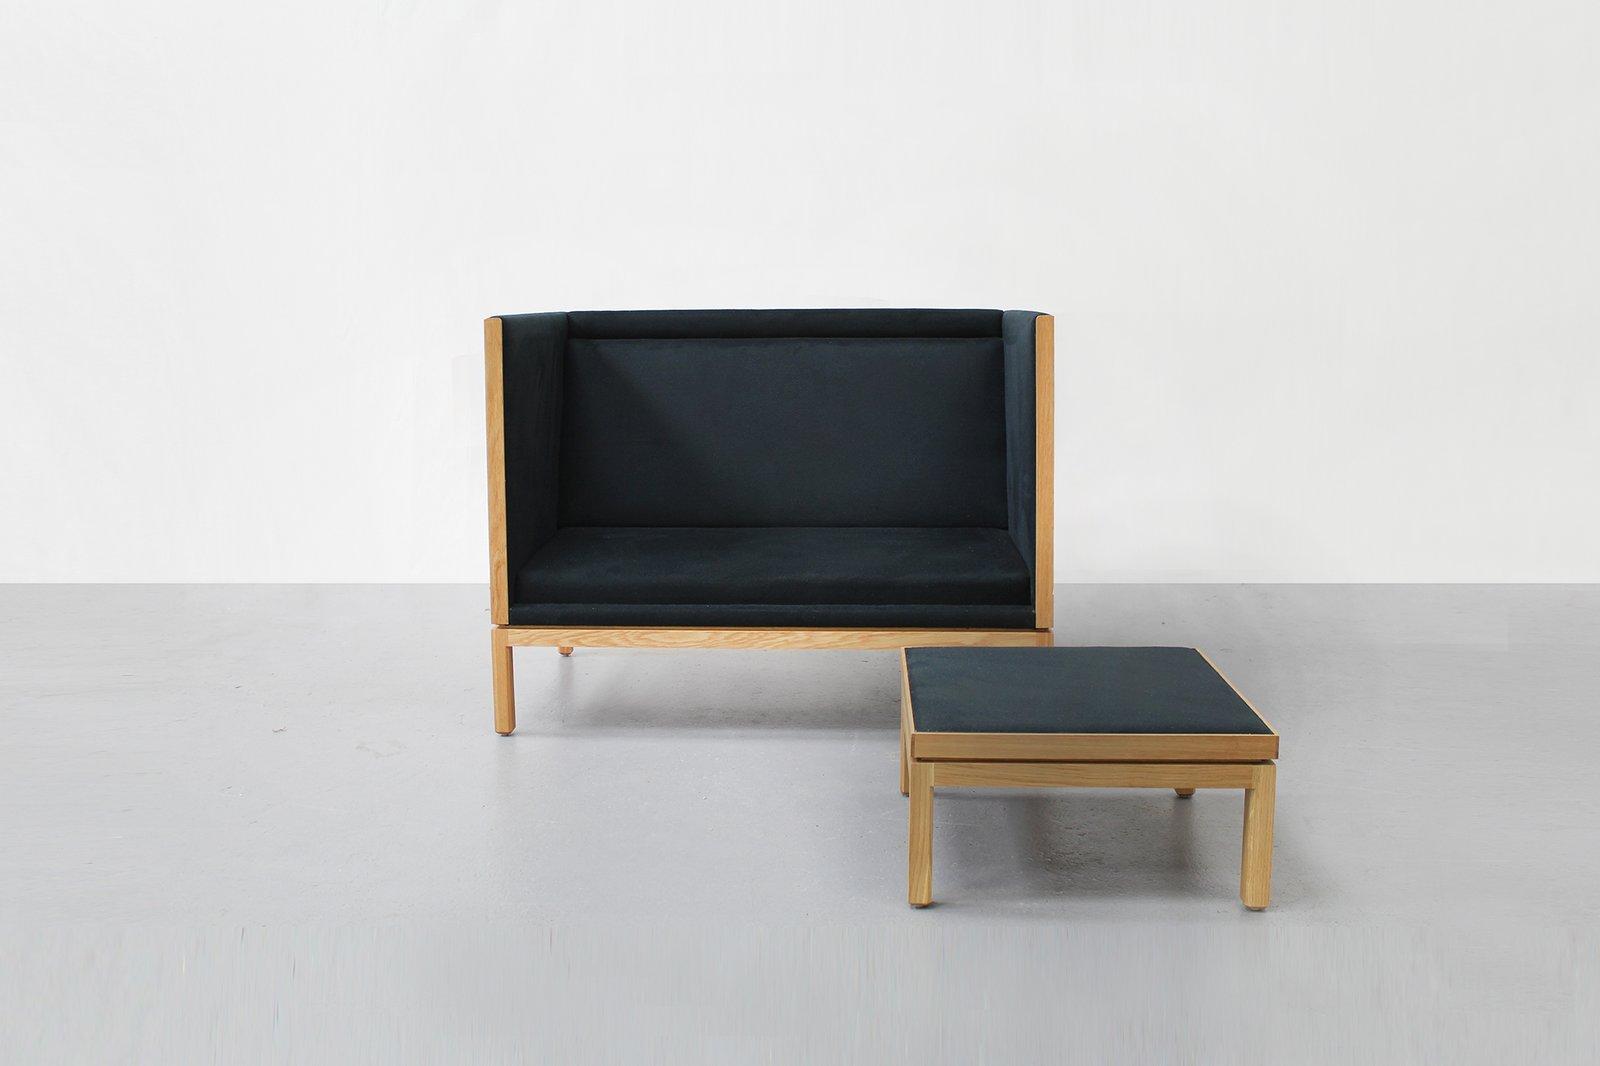 #seatingdesign #seating #MichaelAnastassiades #sofa #Rochester #minimalist #modern #design #furniture   100+ Best Modern Seating Designs